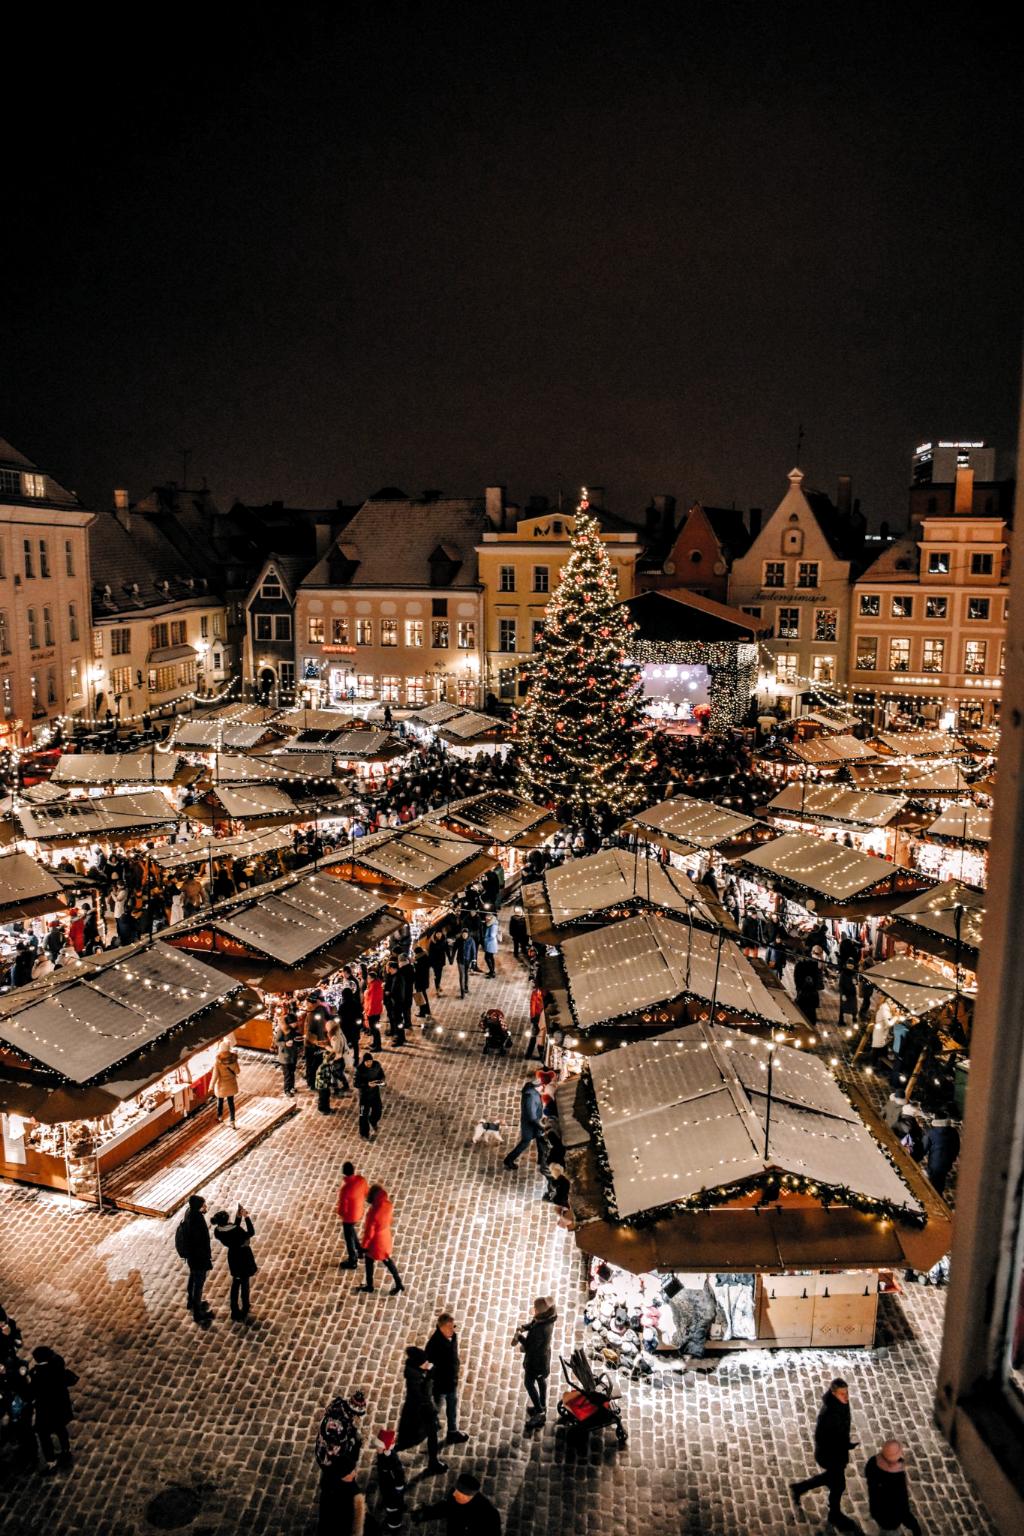 Beautiful medieval Christmas Market in Tallinn Estonia #tallinn #estonia #christmasmarket #europe #travel